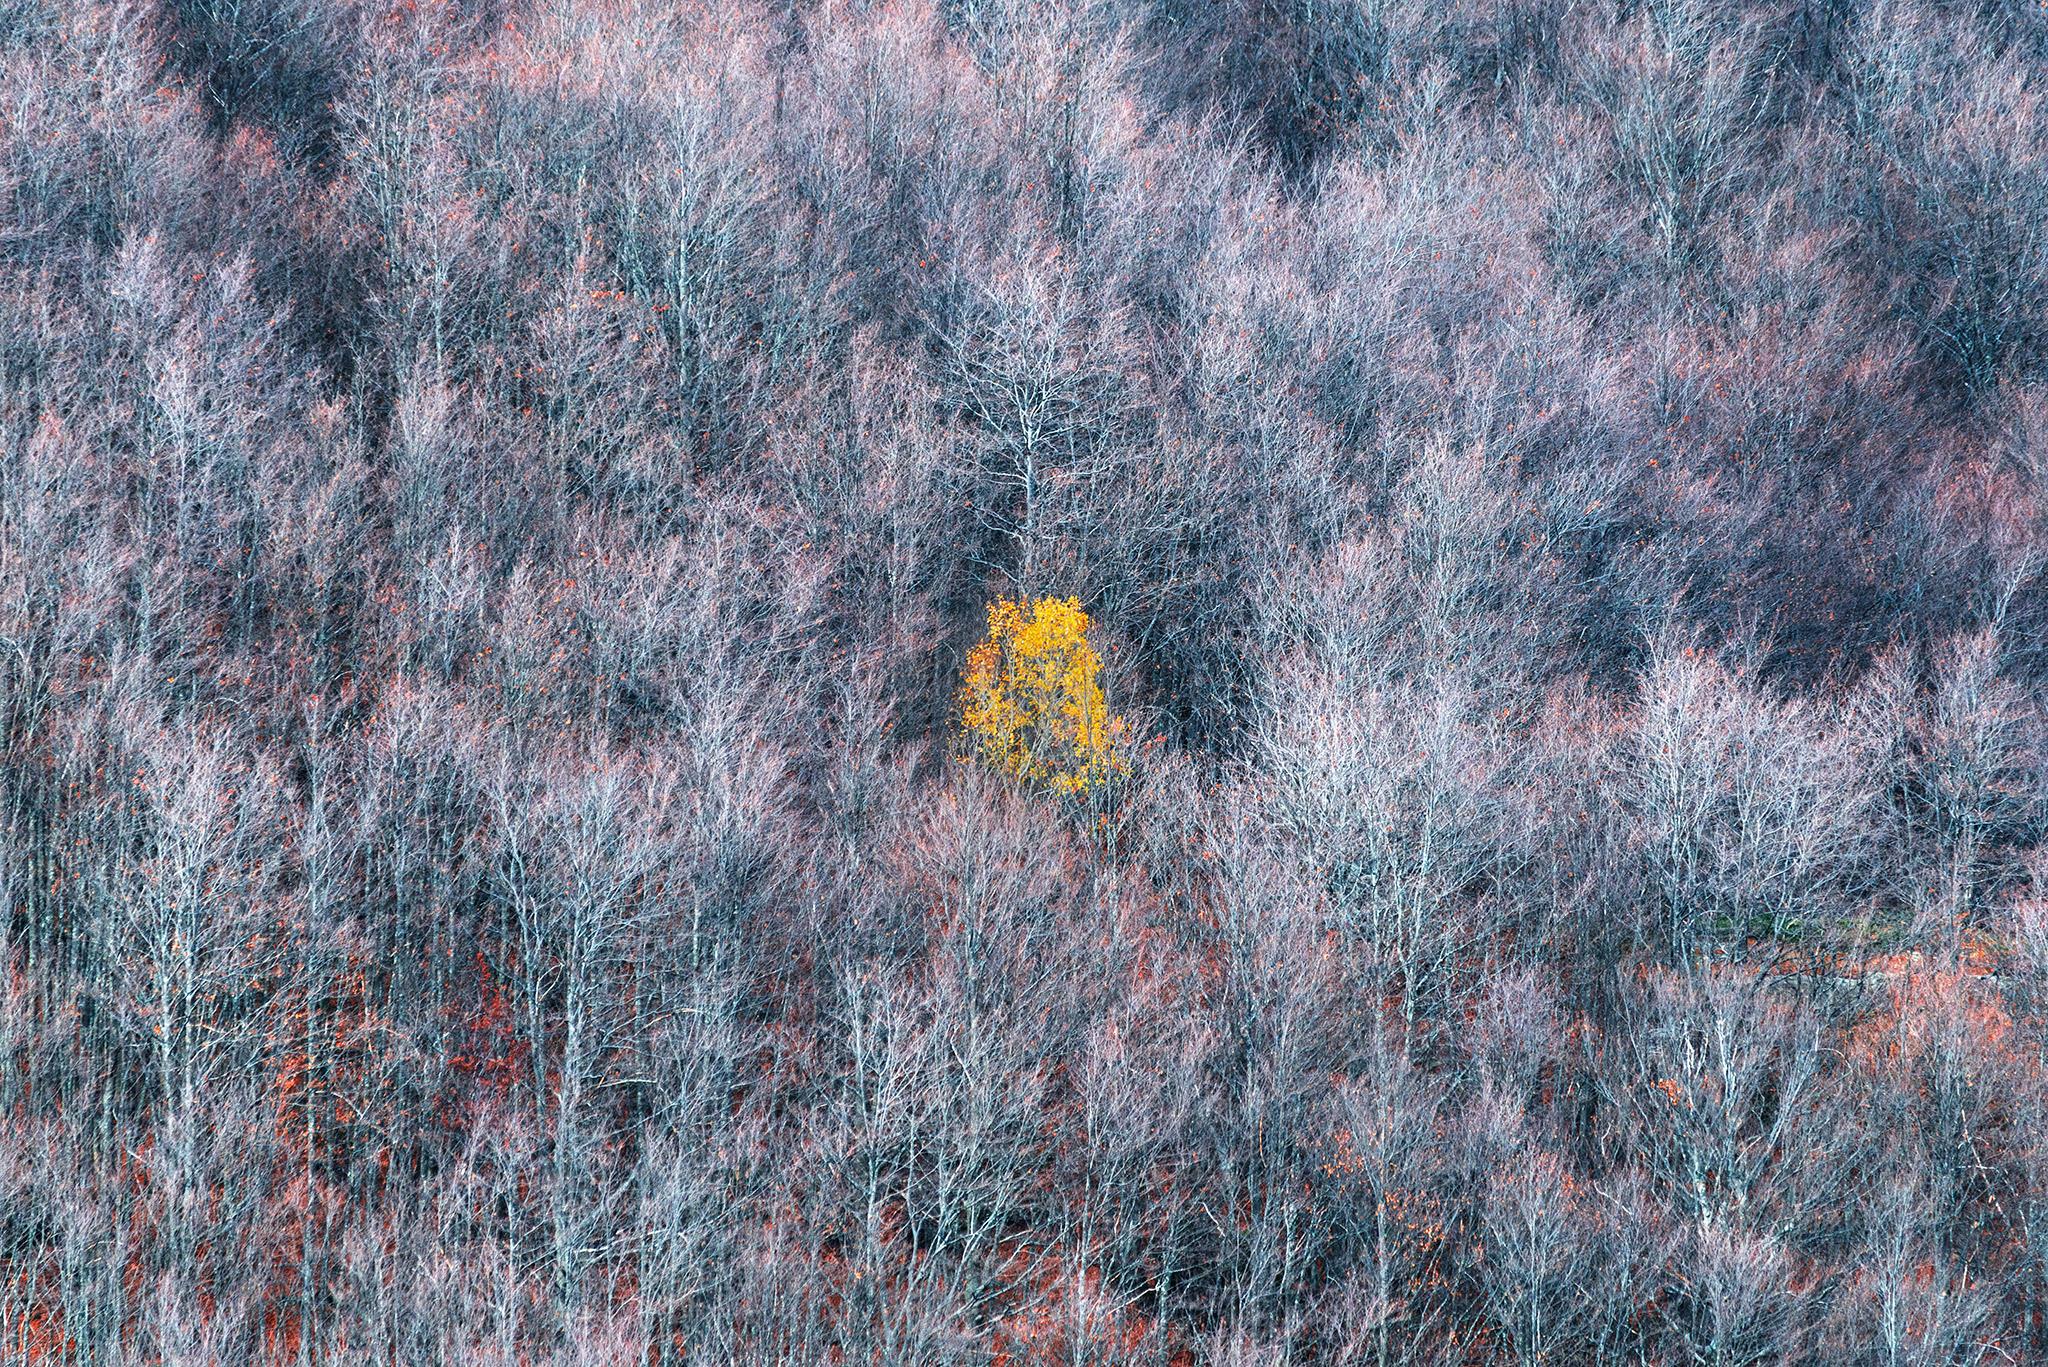 How to Take Landscape Photographs That Evoke Emotion